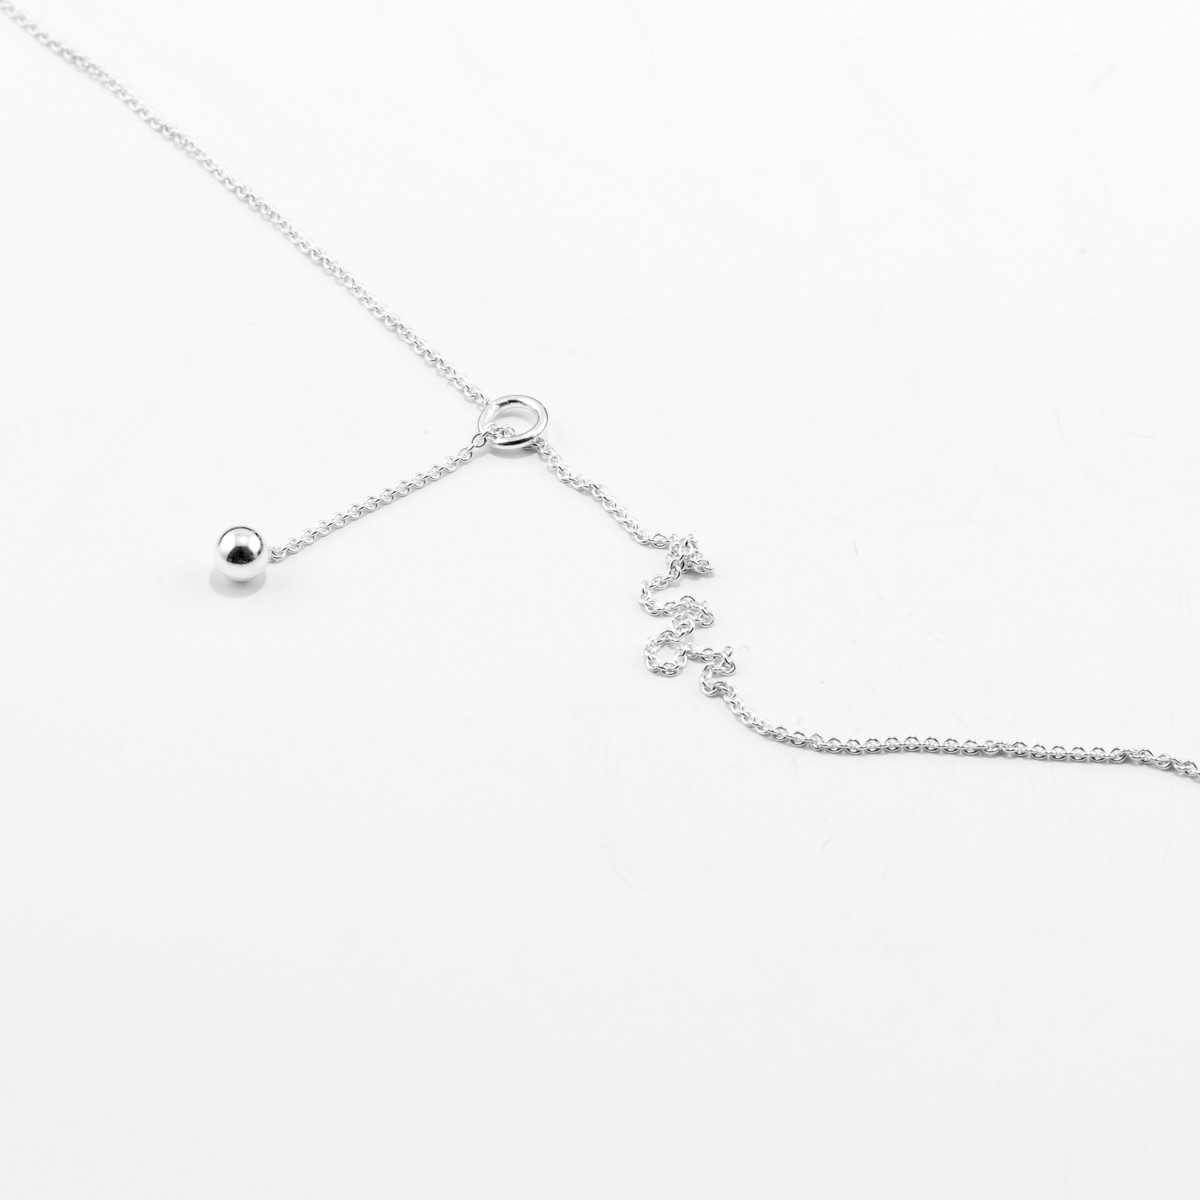 Jonathan Radetz Jewellery, Kette SPHERE, Länge 55cm, Silber 925